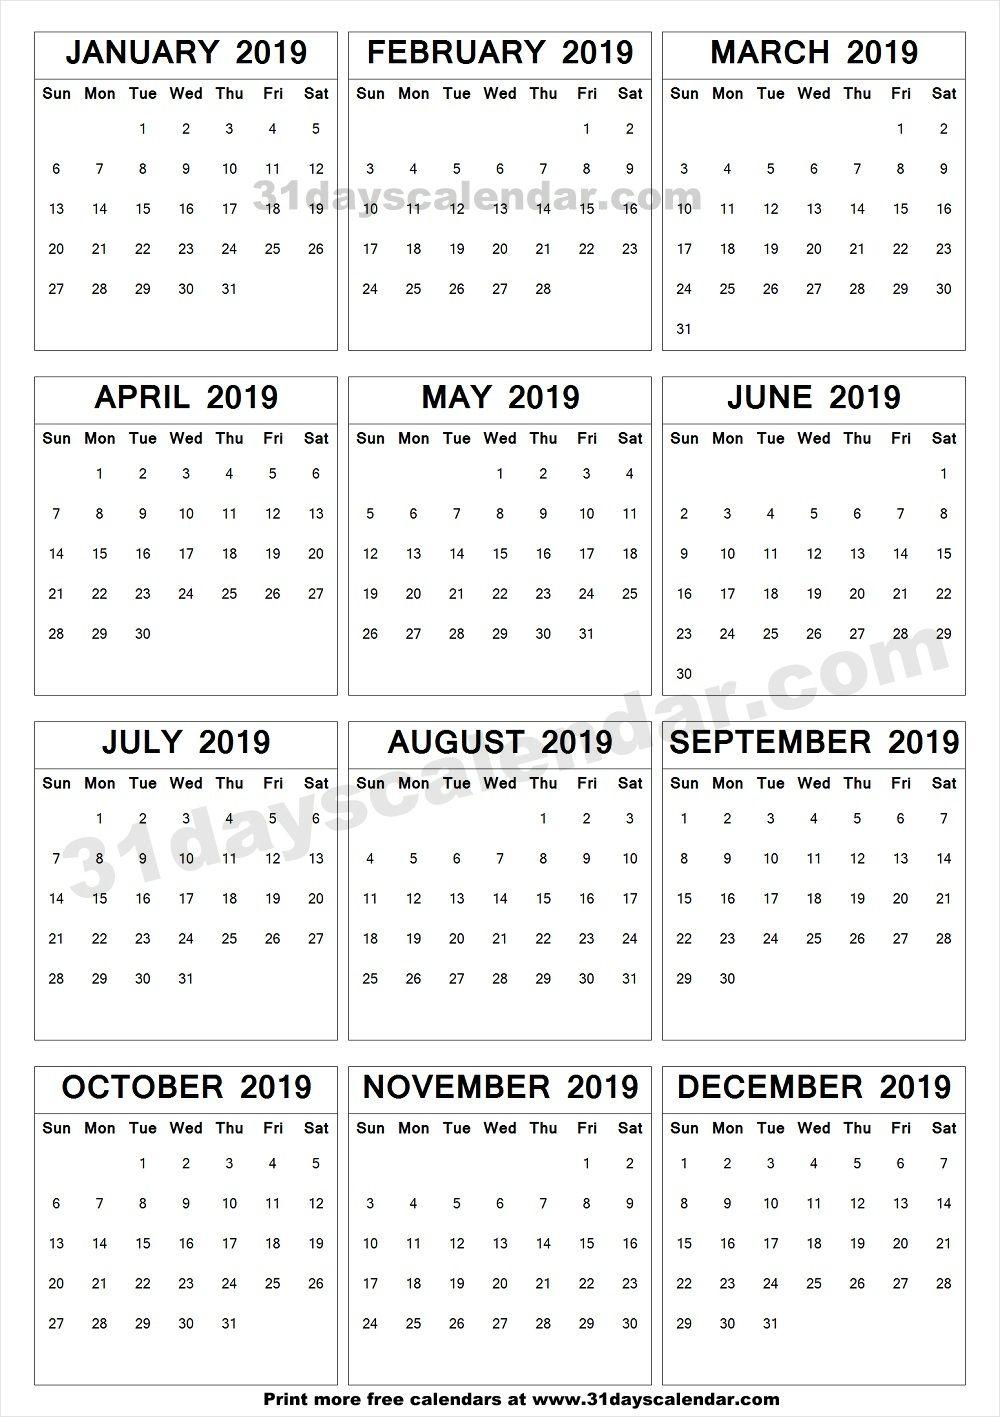 Blank Calendar 2019 To Print 2019 A4 Calendar To Print | Yearly Calendar 2019 | Printable blank